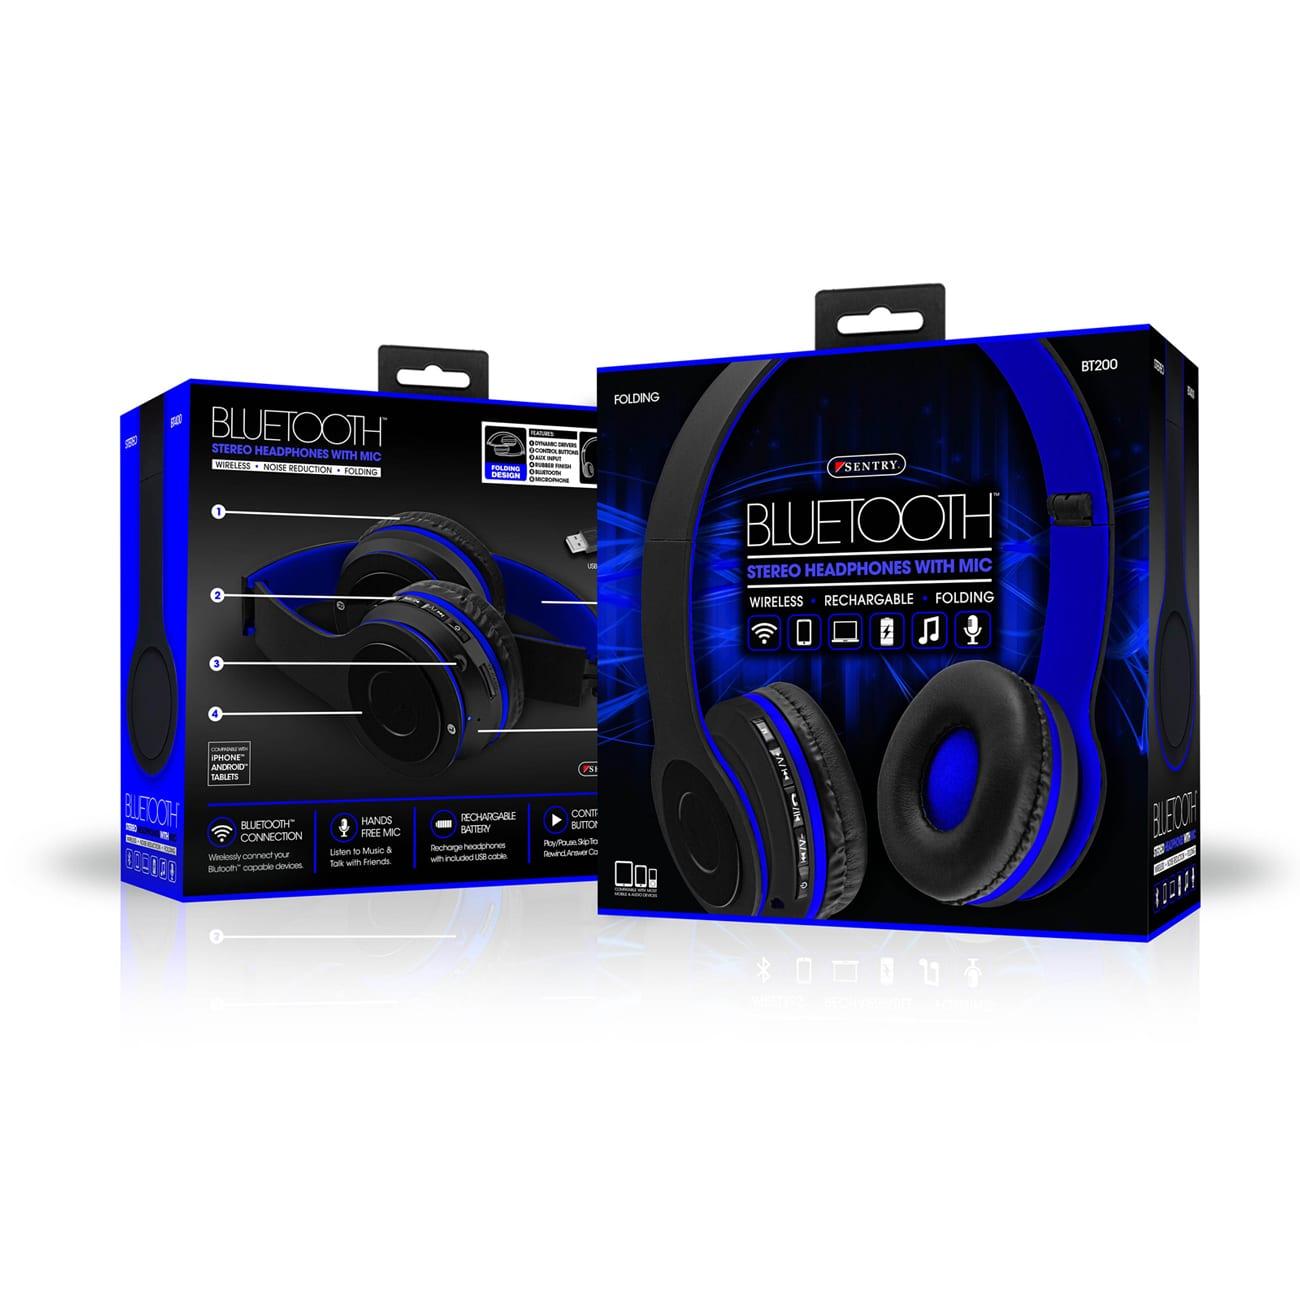 Sentry Industries BT200: Wireless Bluetooth Headset In Blue